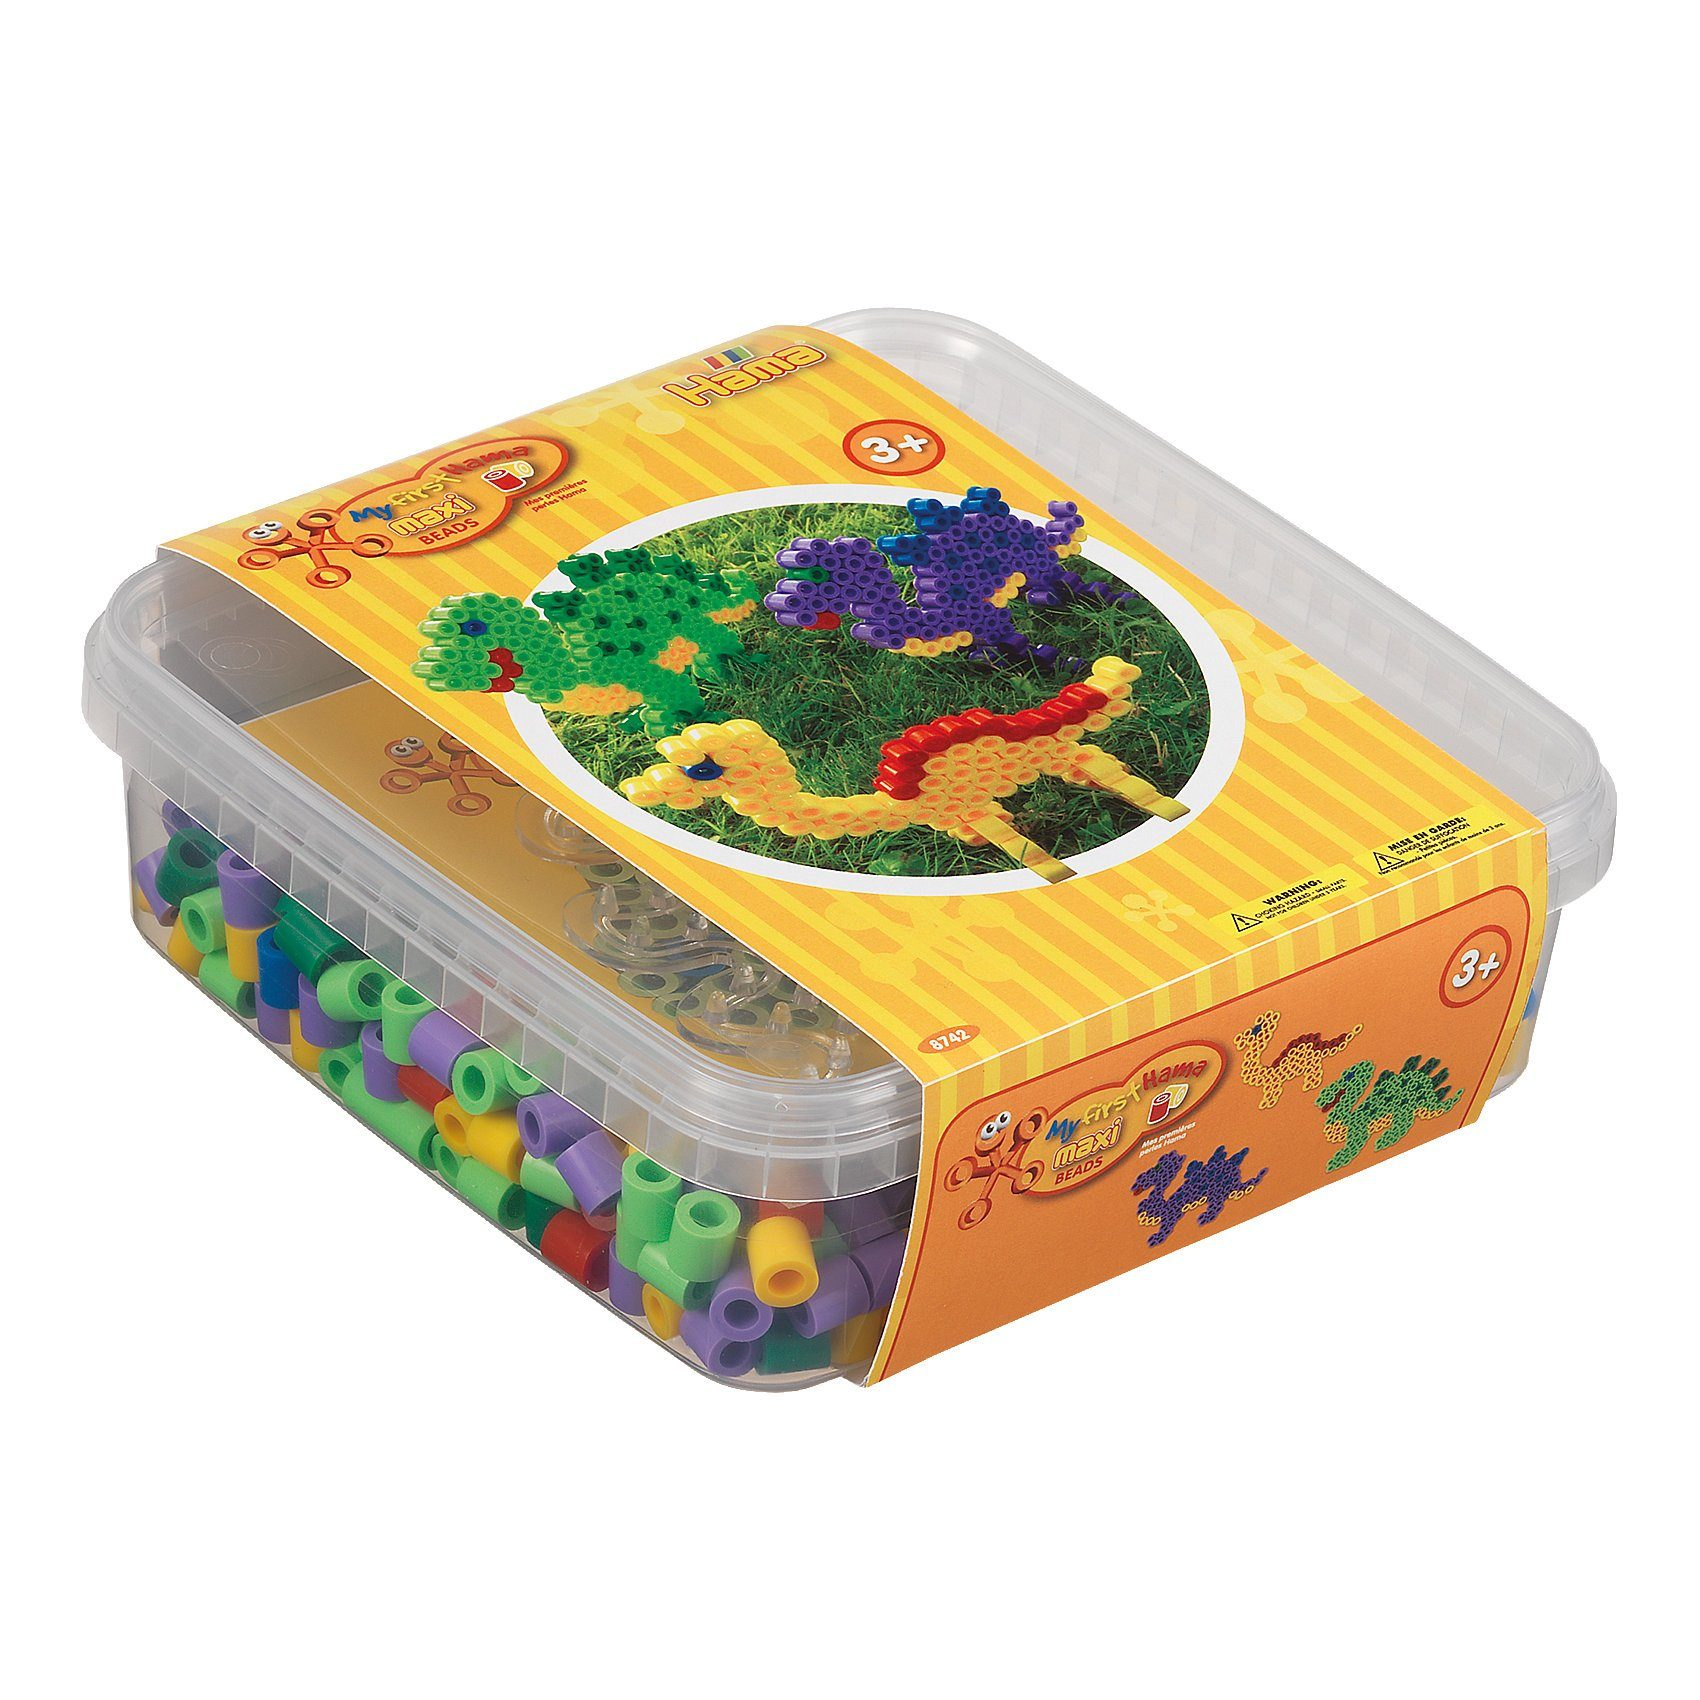 Hama Perlen HAMA 8742 Box gelb, 600 maxi-Perlen & Zubehör